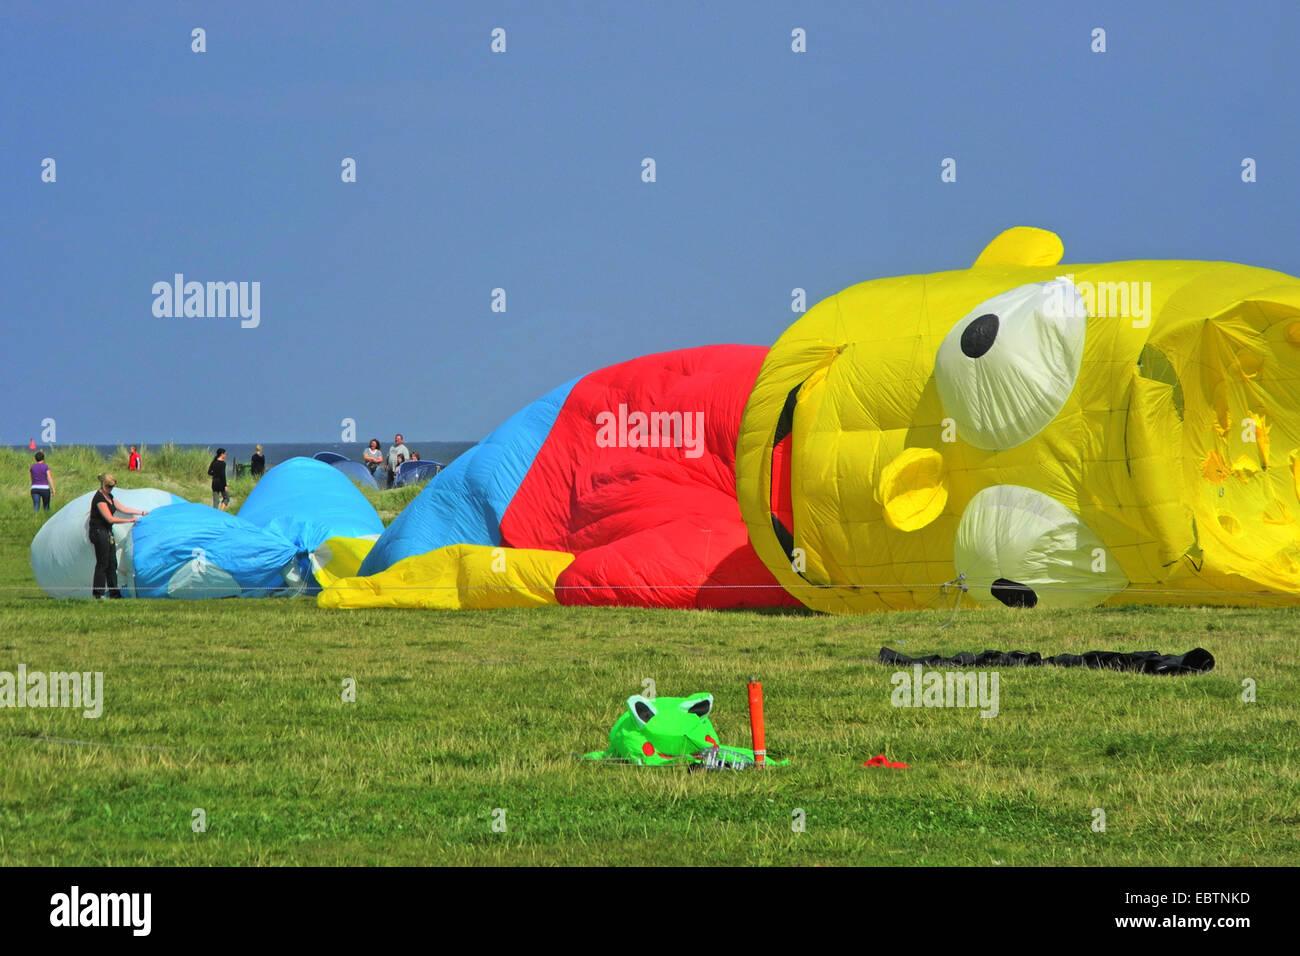 kites at the kite festival in Schillig, Bart Simpson, Germany, Lower Saxony, Frisia, Wangerland - Stock Image